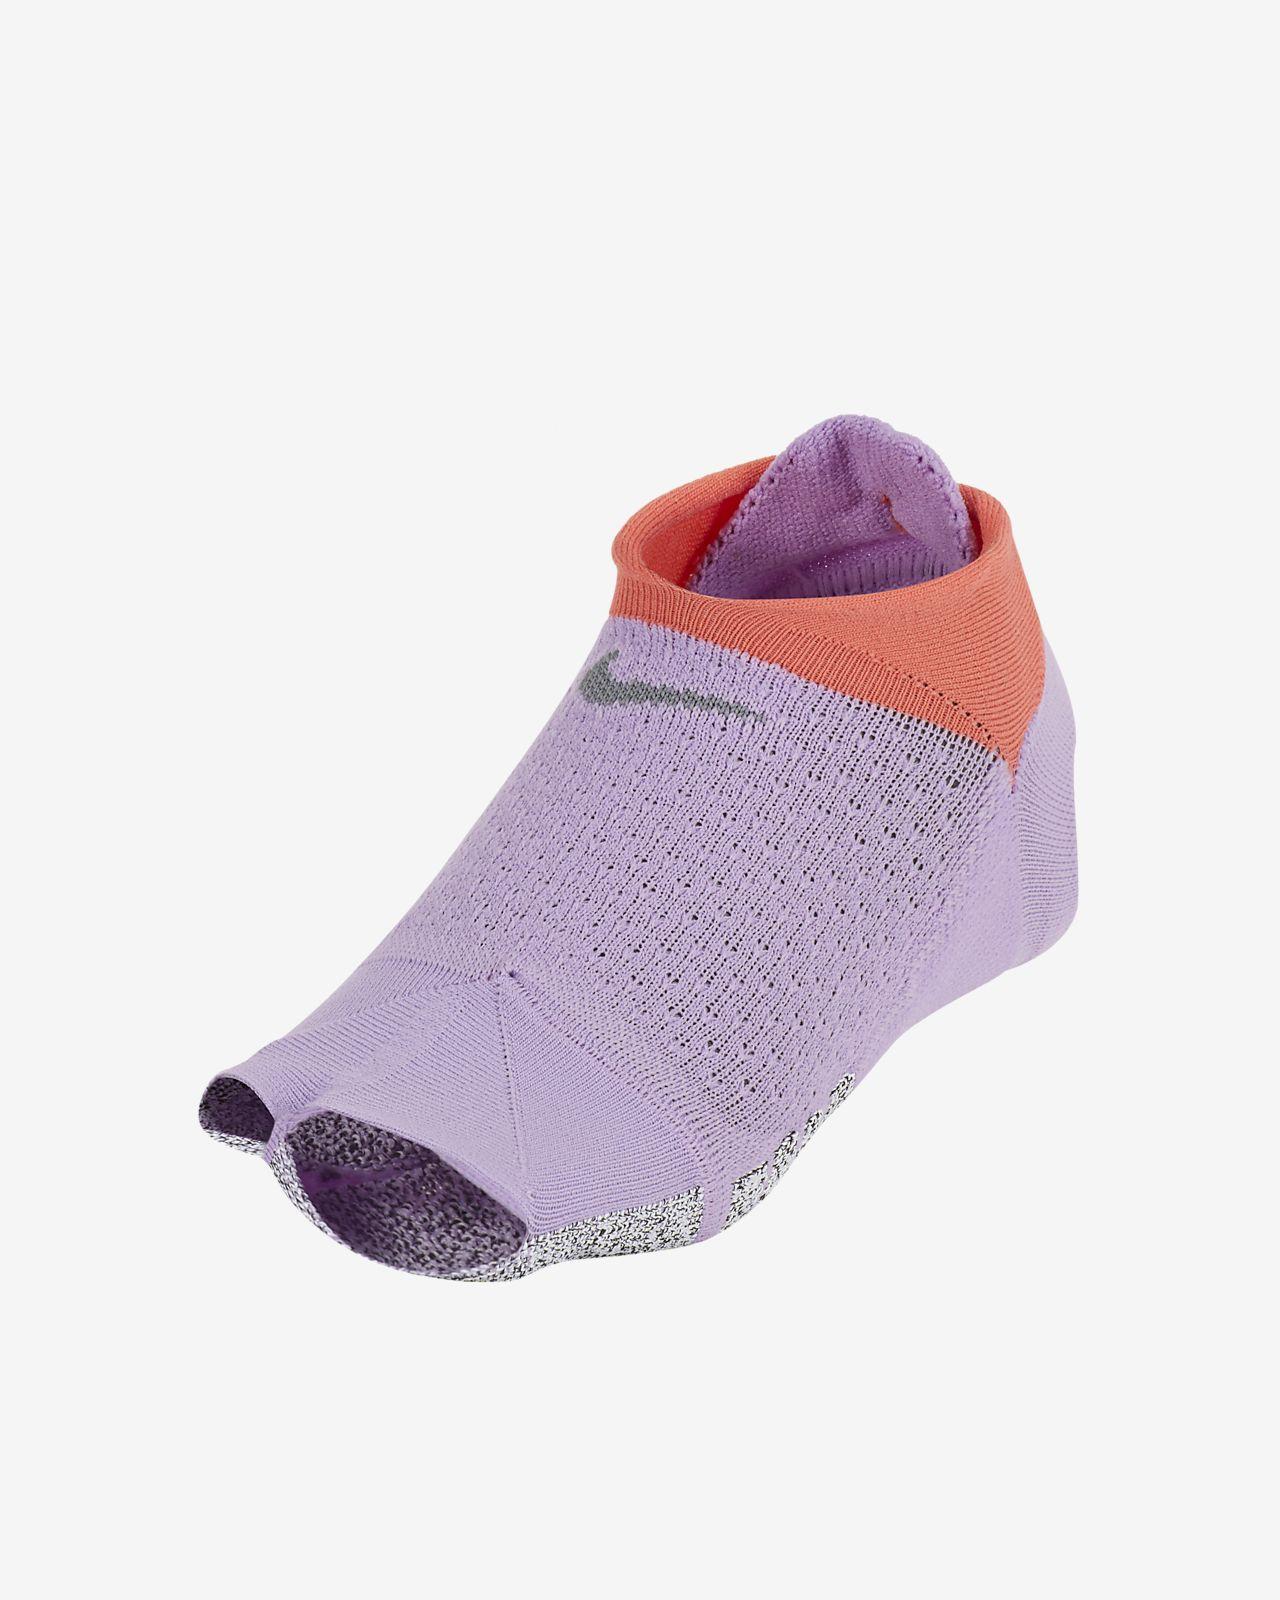 NikeGrip Studio footie-sokker uten tær til dame